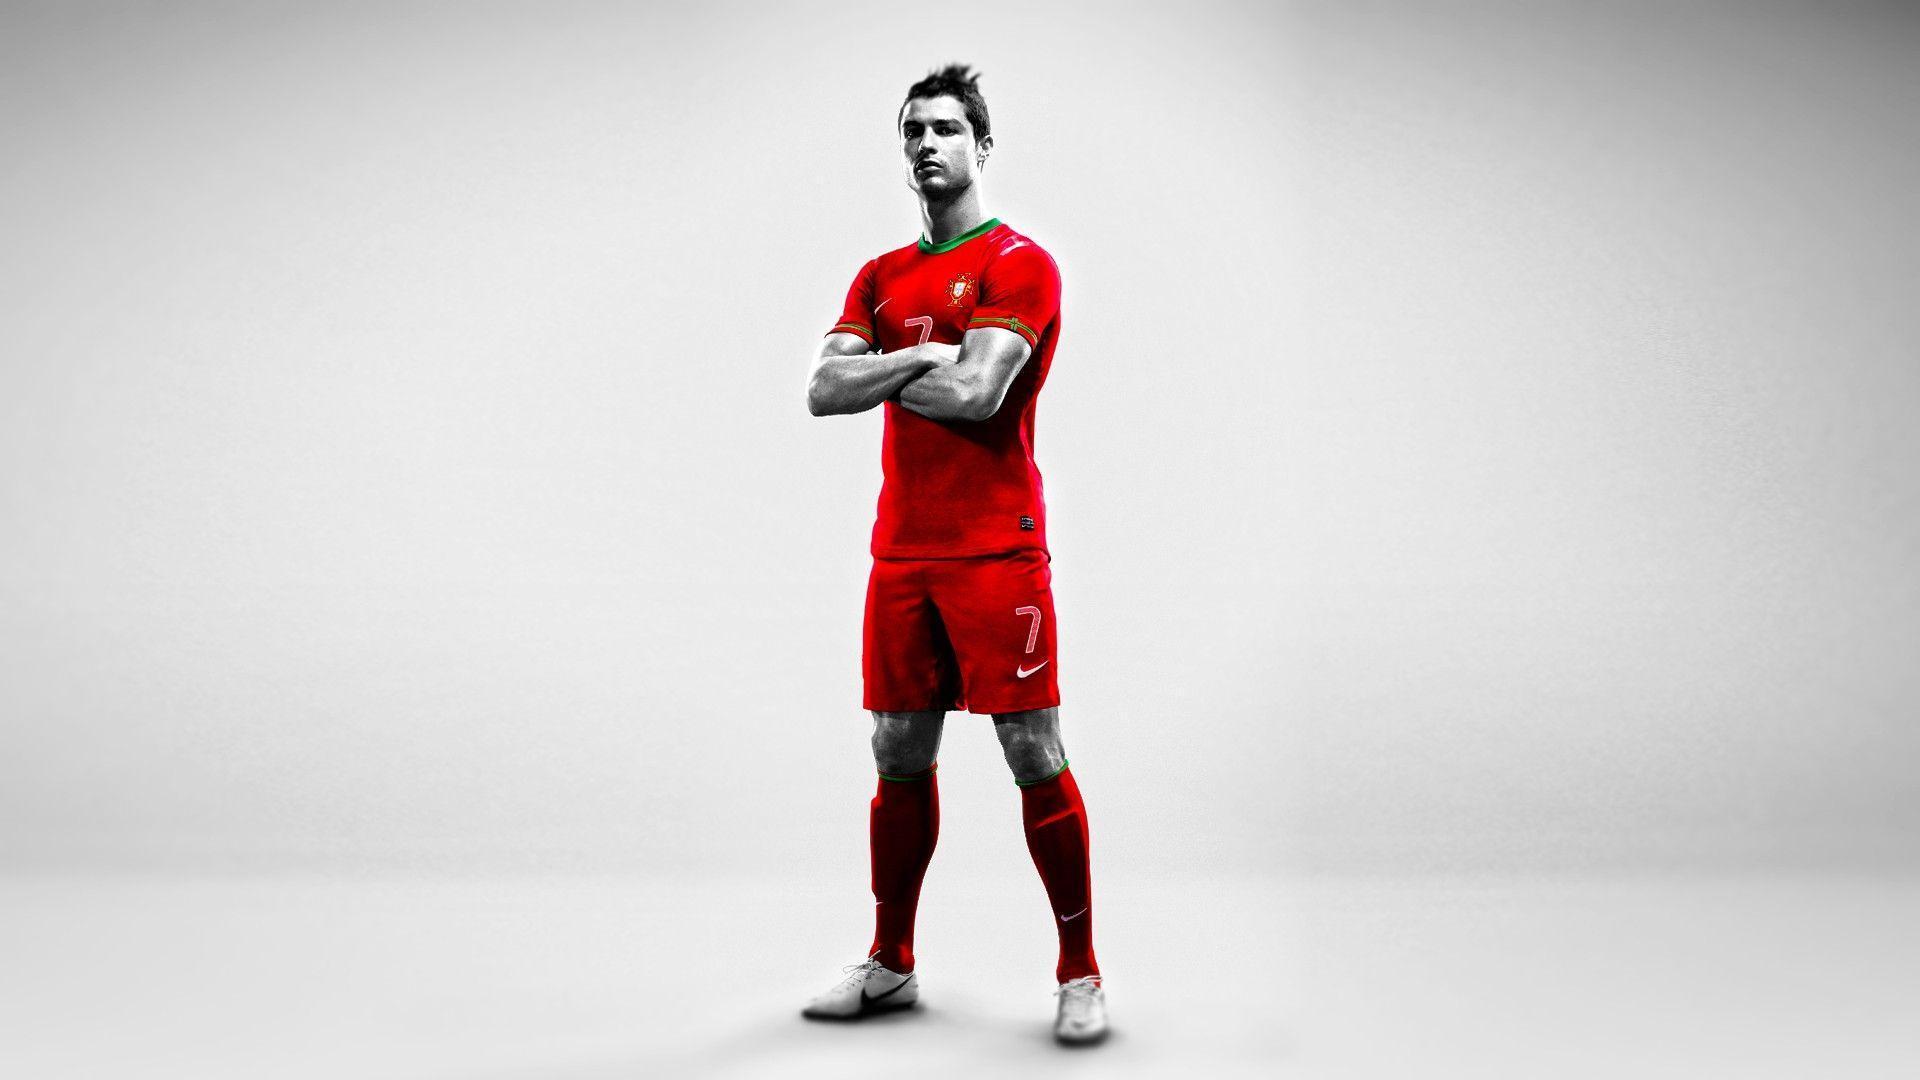 Cristiano Ronaldo Wallpaper 2012 | Free HD Wallpapers for Desktop ...